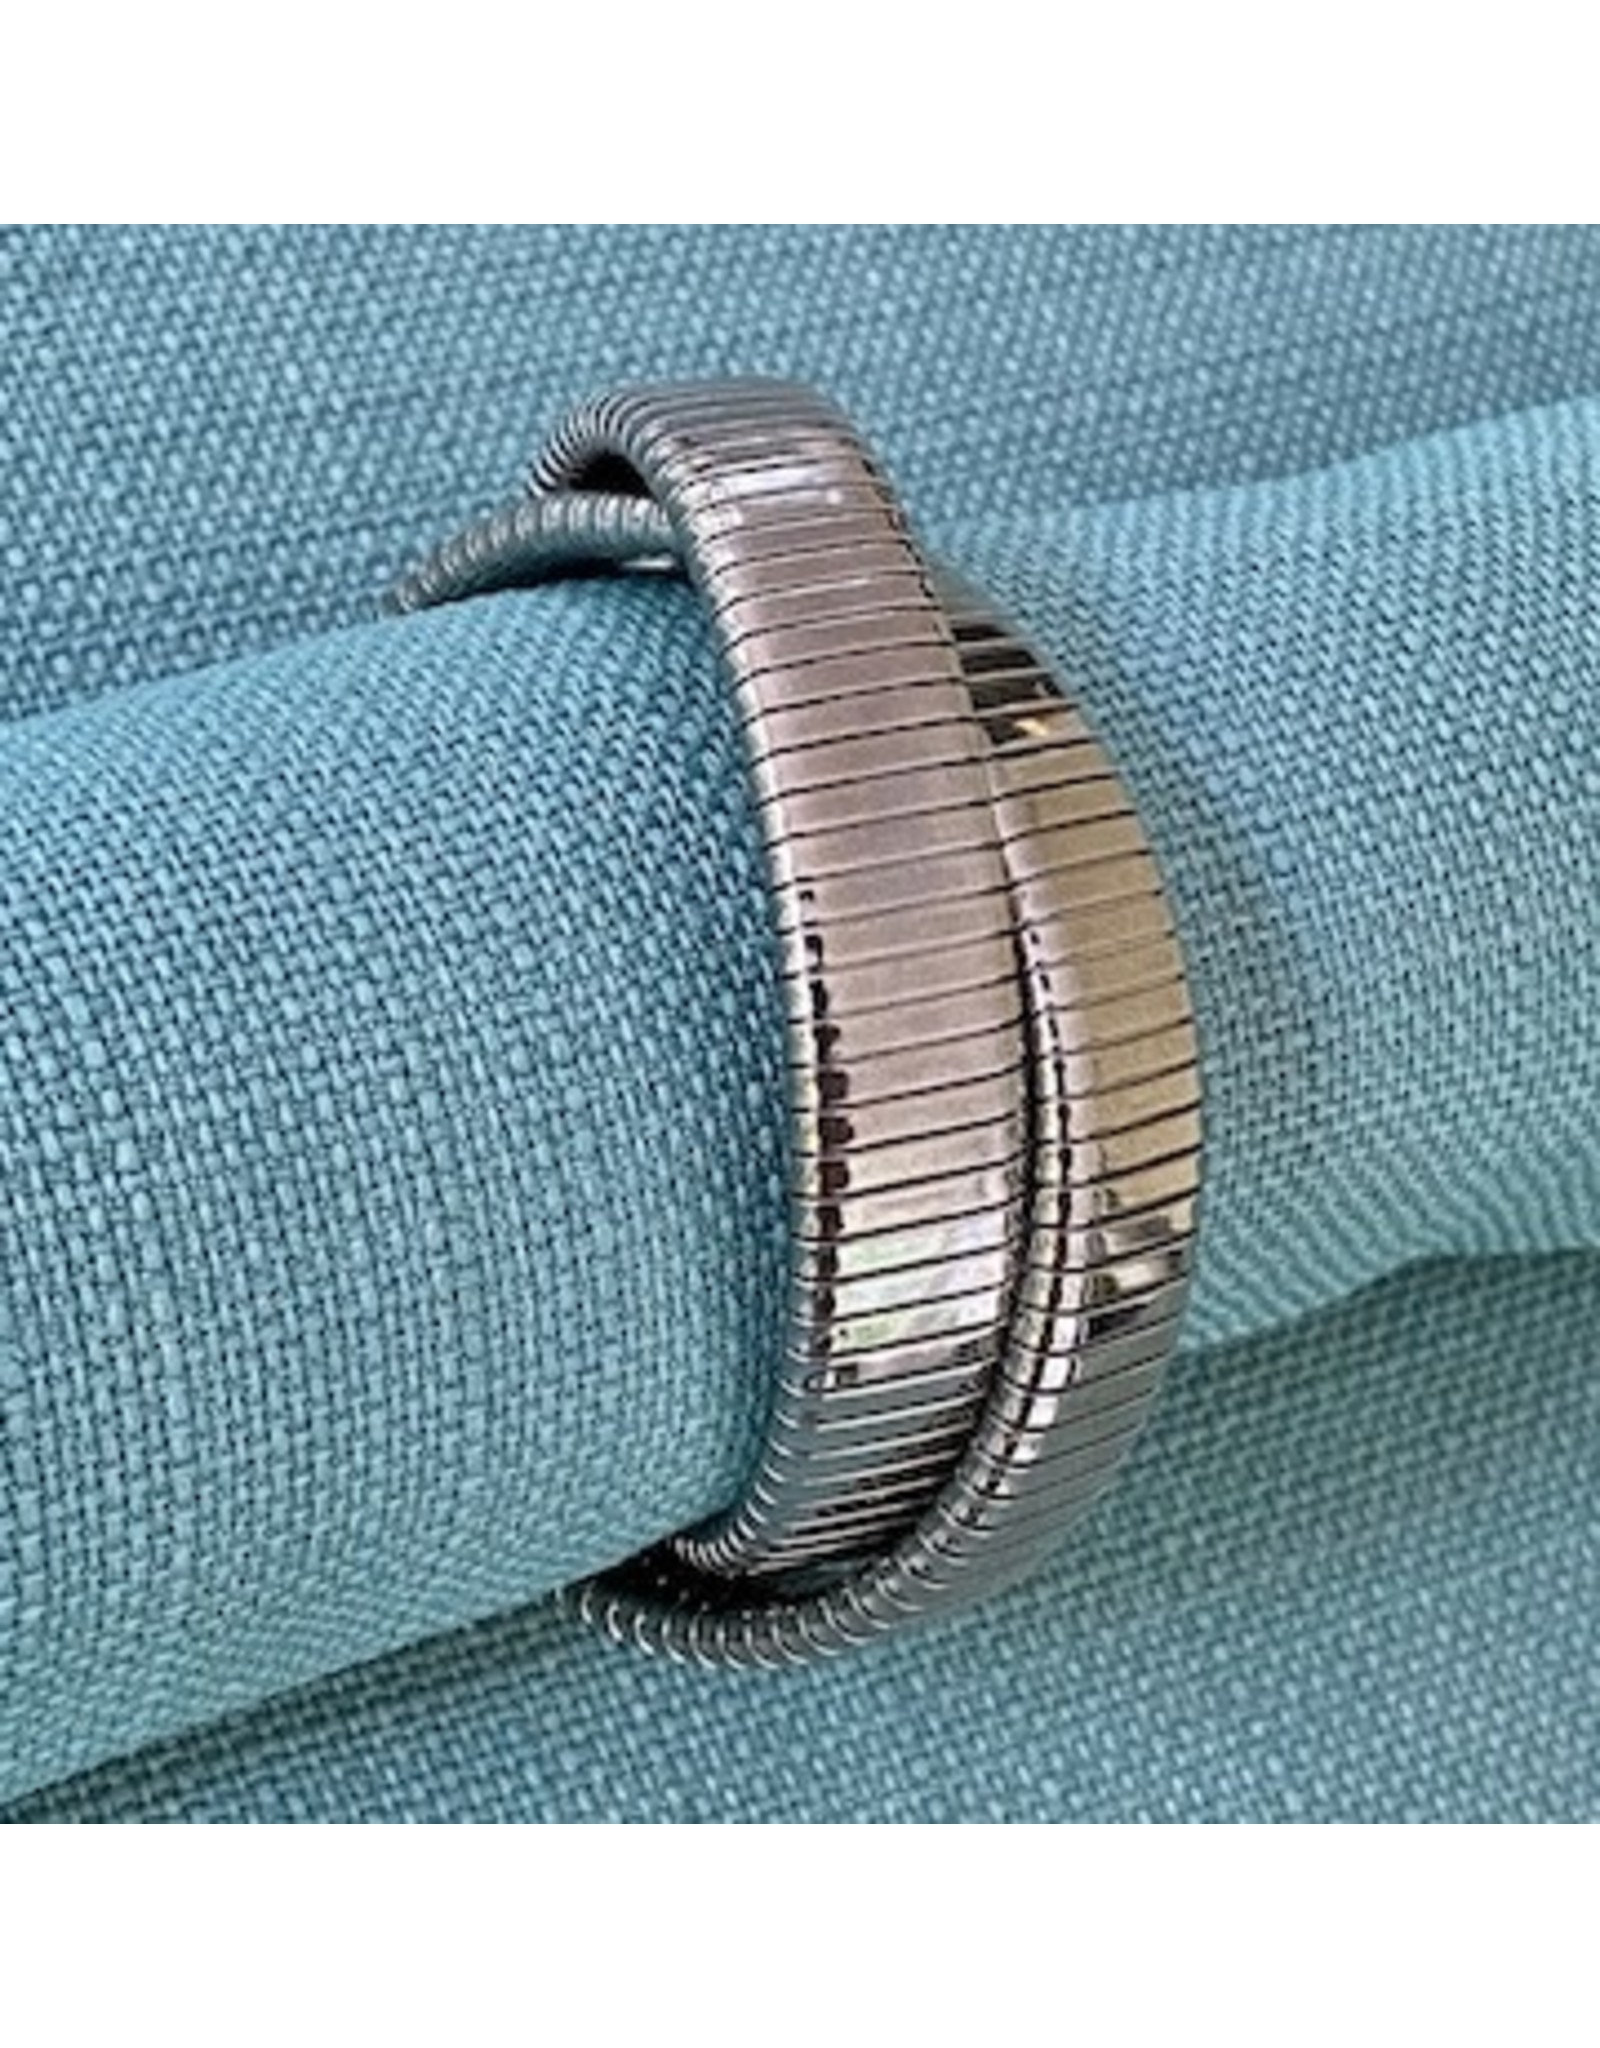 Janis Savitt VCExclusives: Cobra Silver Double